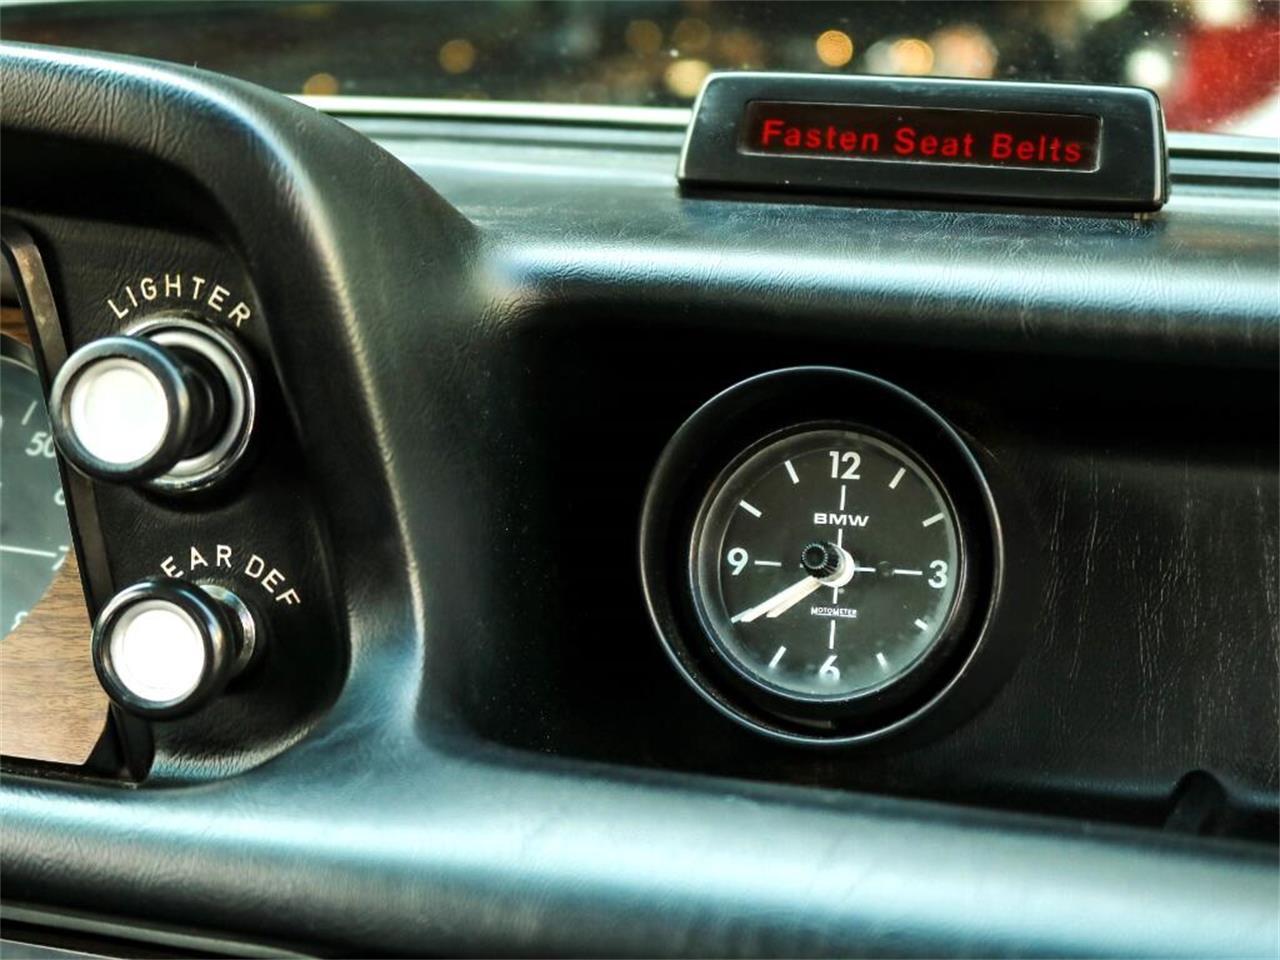 1974 BMW 2002 (CC-1051857) for sale in Marina Del Rey, California